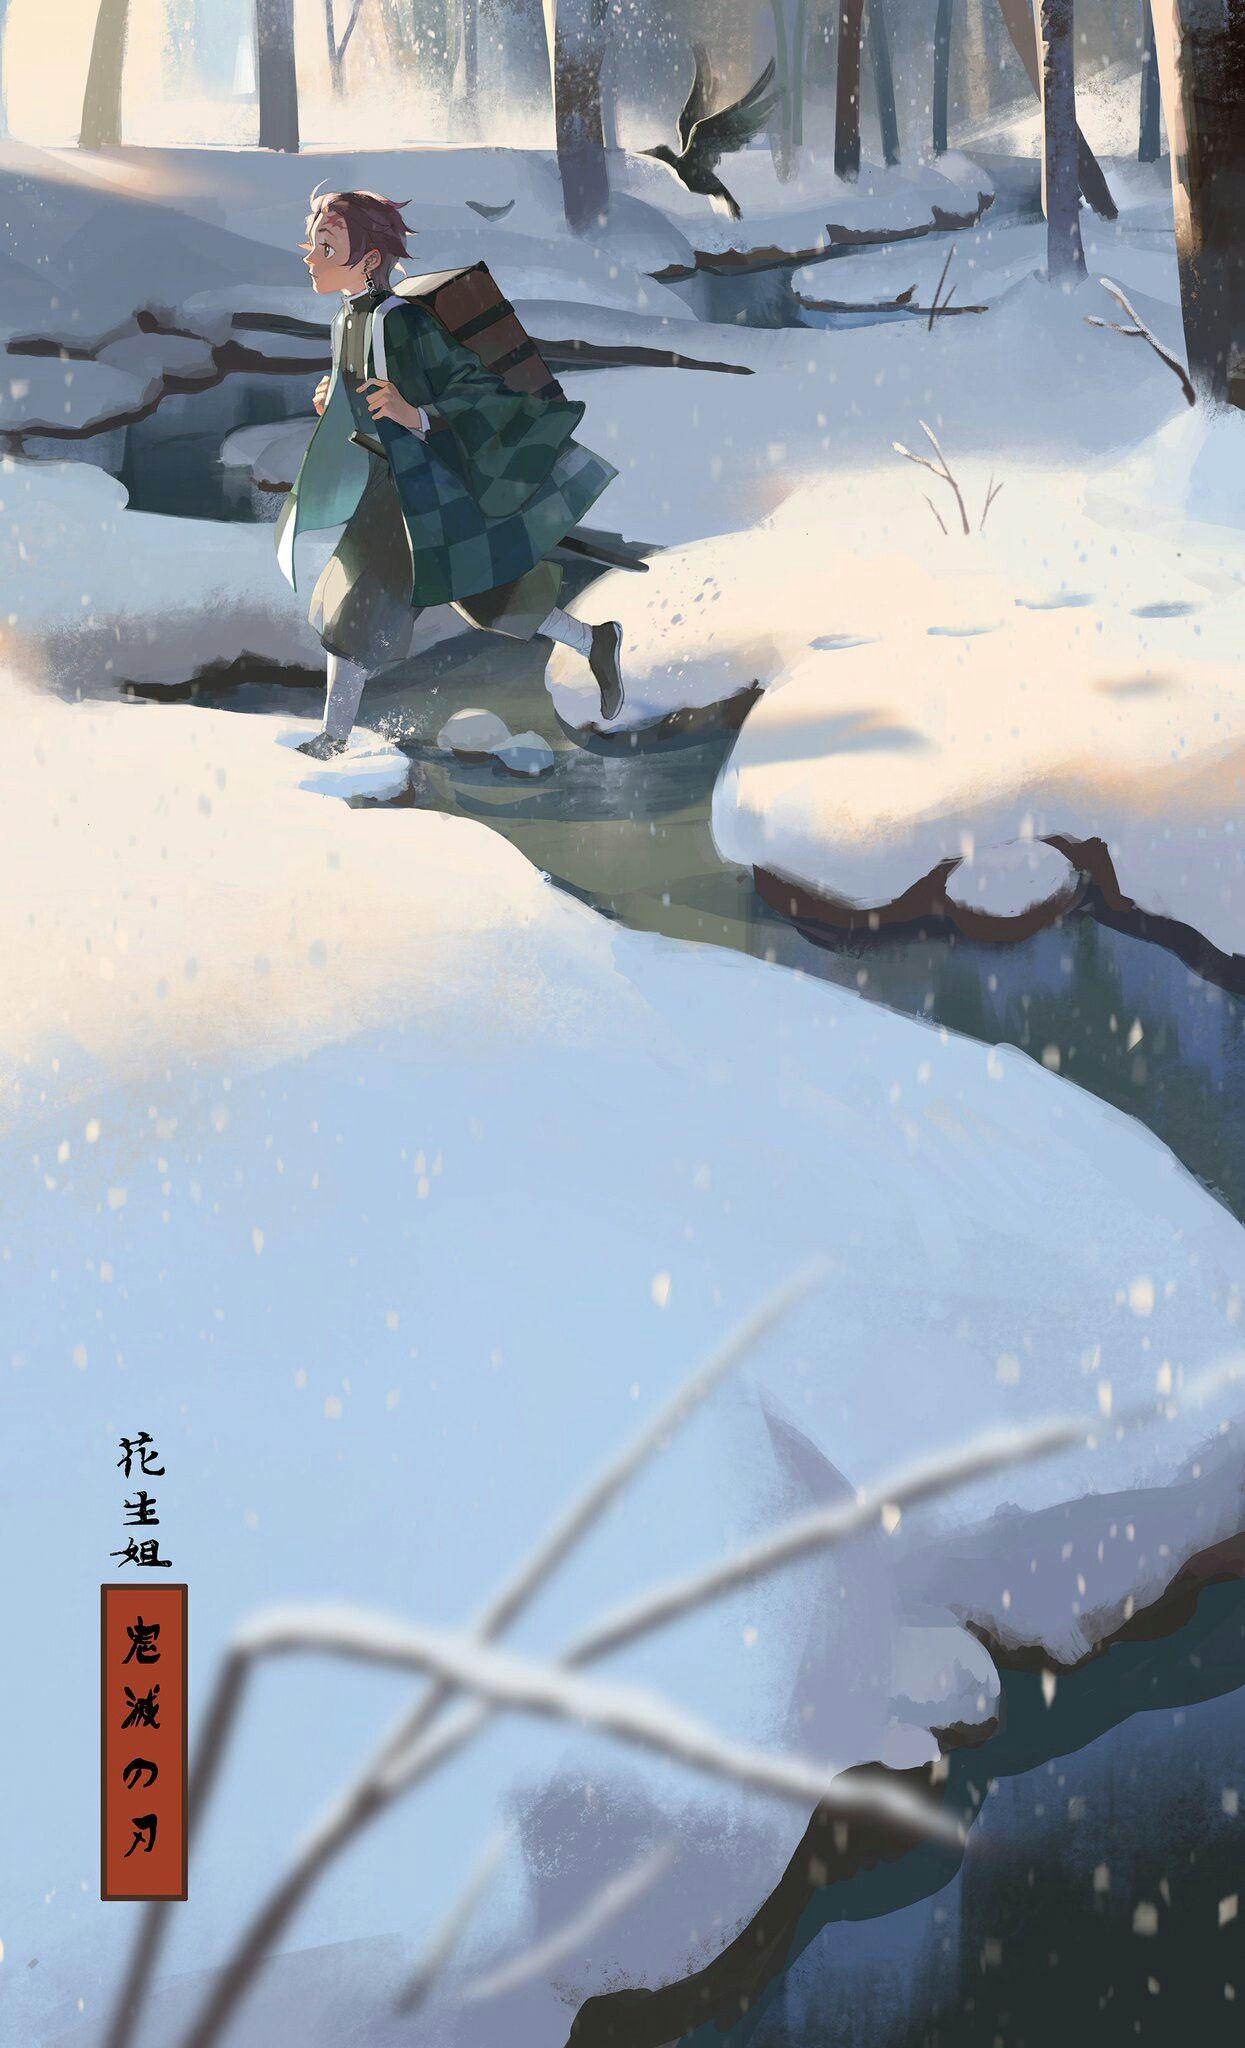 Pin oleh 김 영 애 di reallife Hantu, Seni anime, Seni